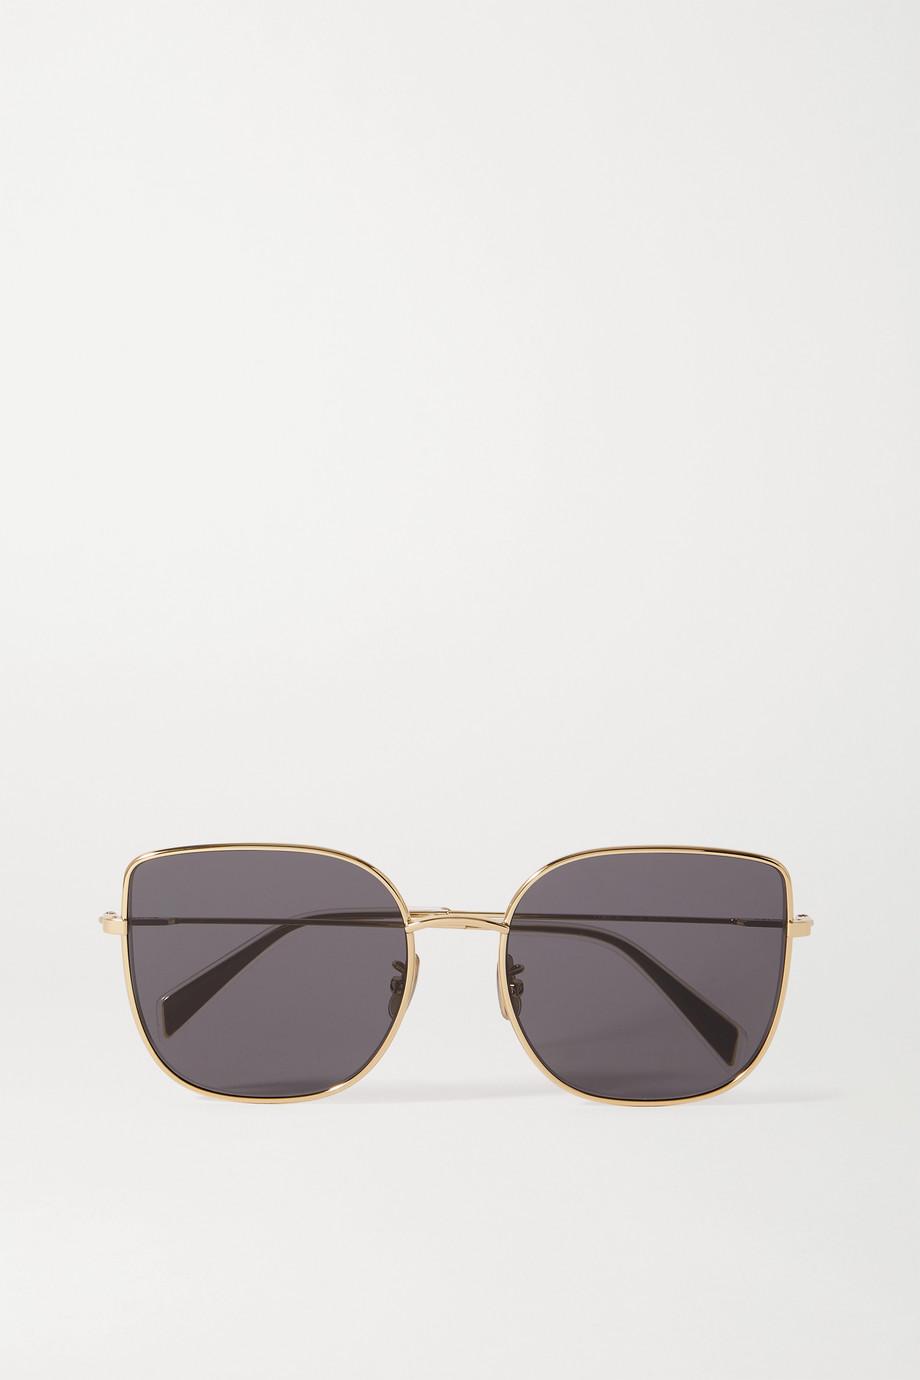 Celine Oversized square-frame gold-tone sunglasses